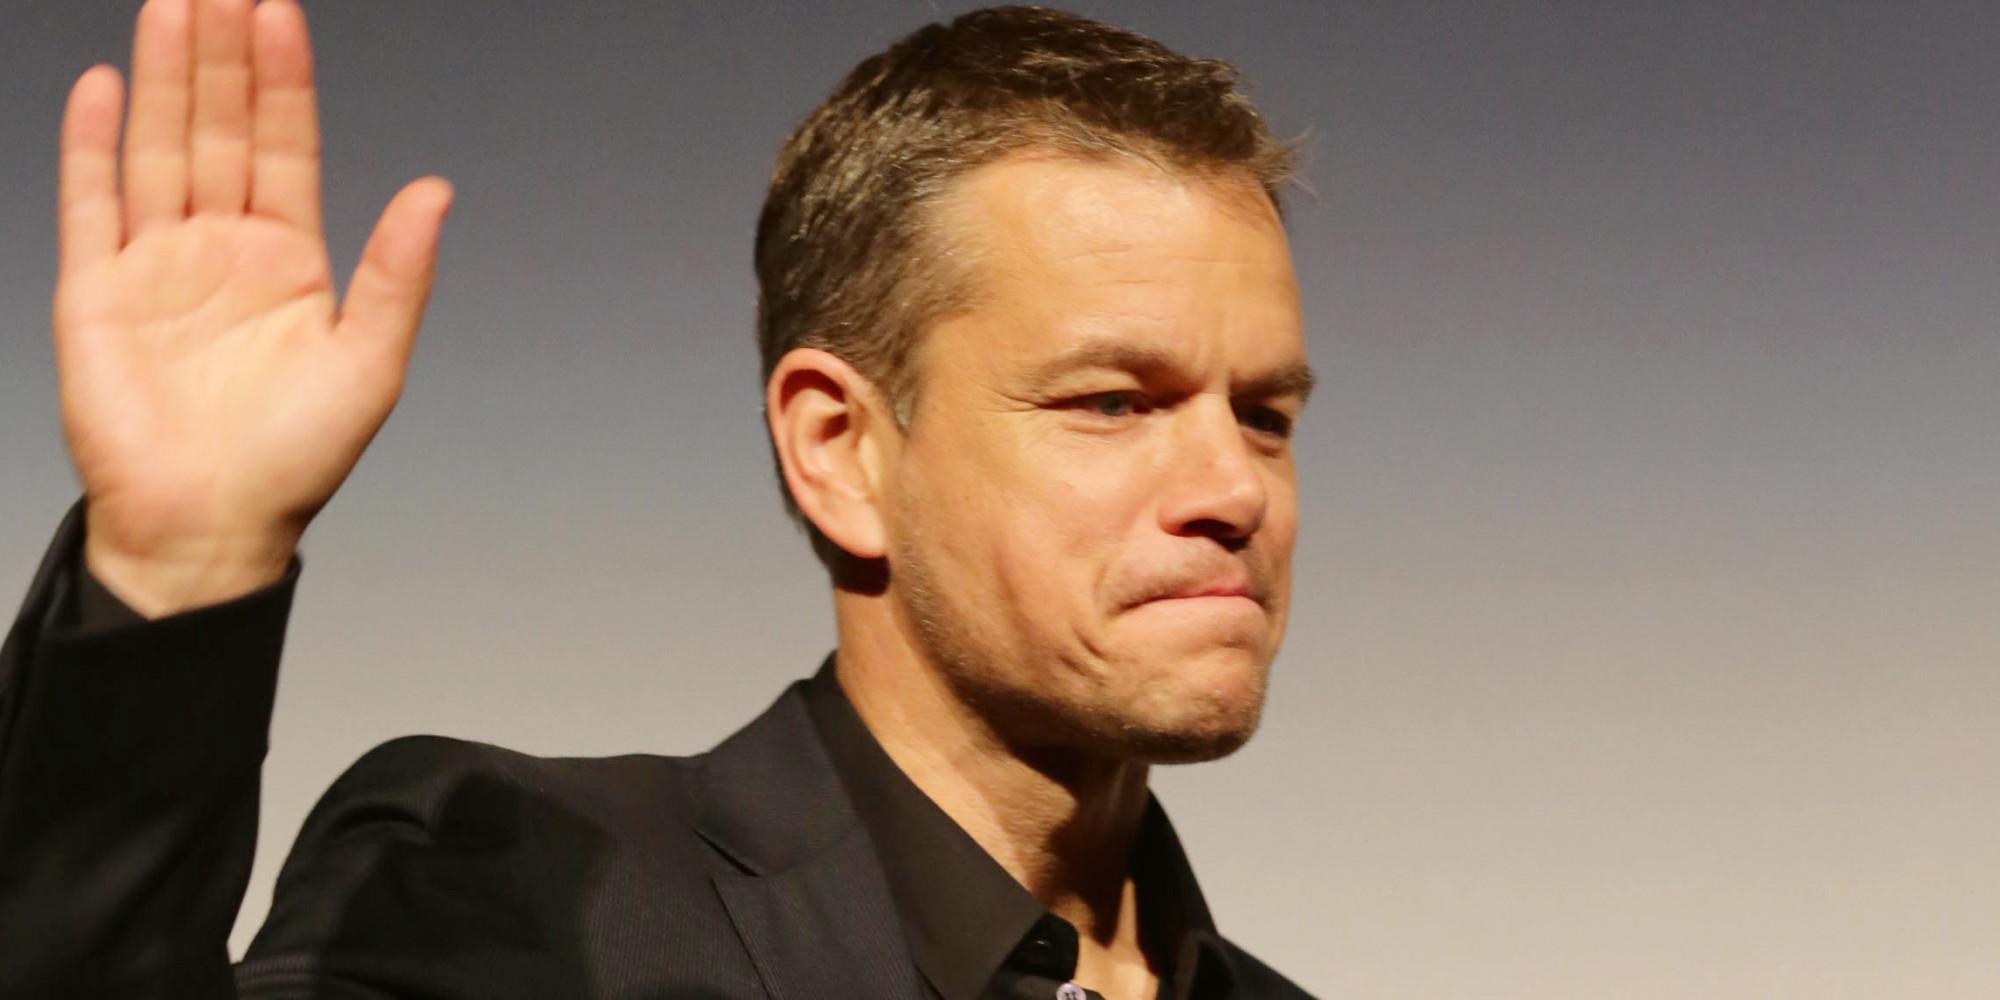 Matt Damon Must Die: Why 'The Martian' Is a Terrible ... Matt Damon